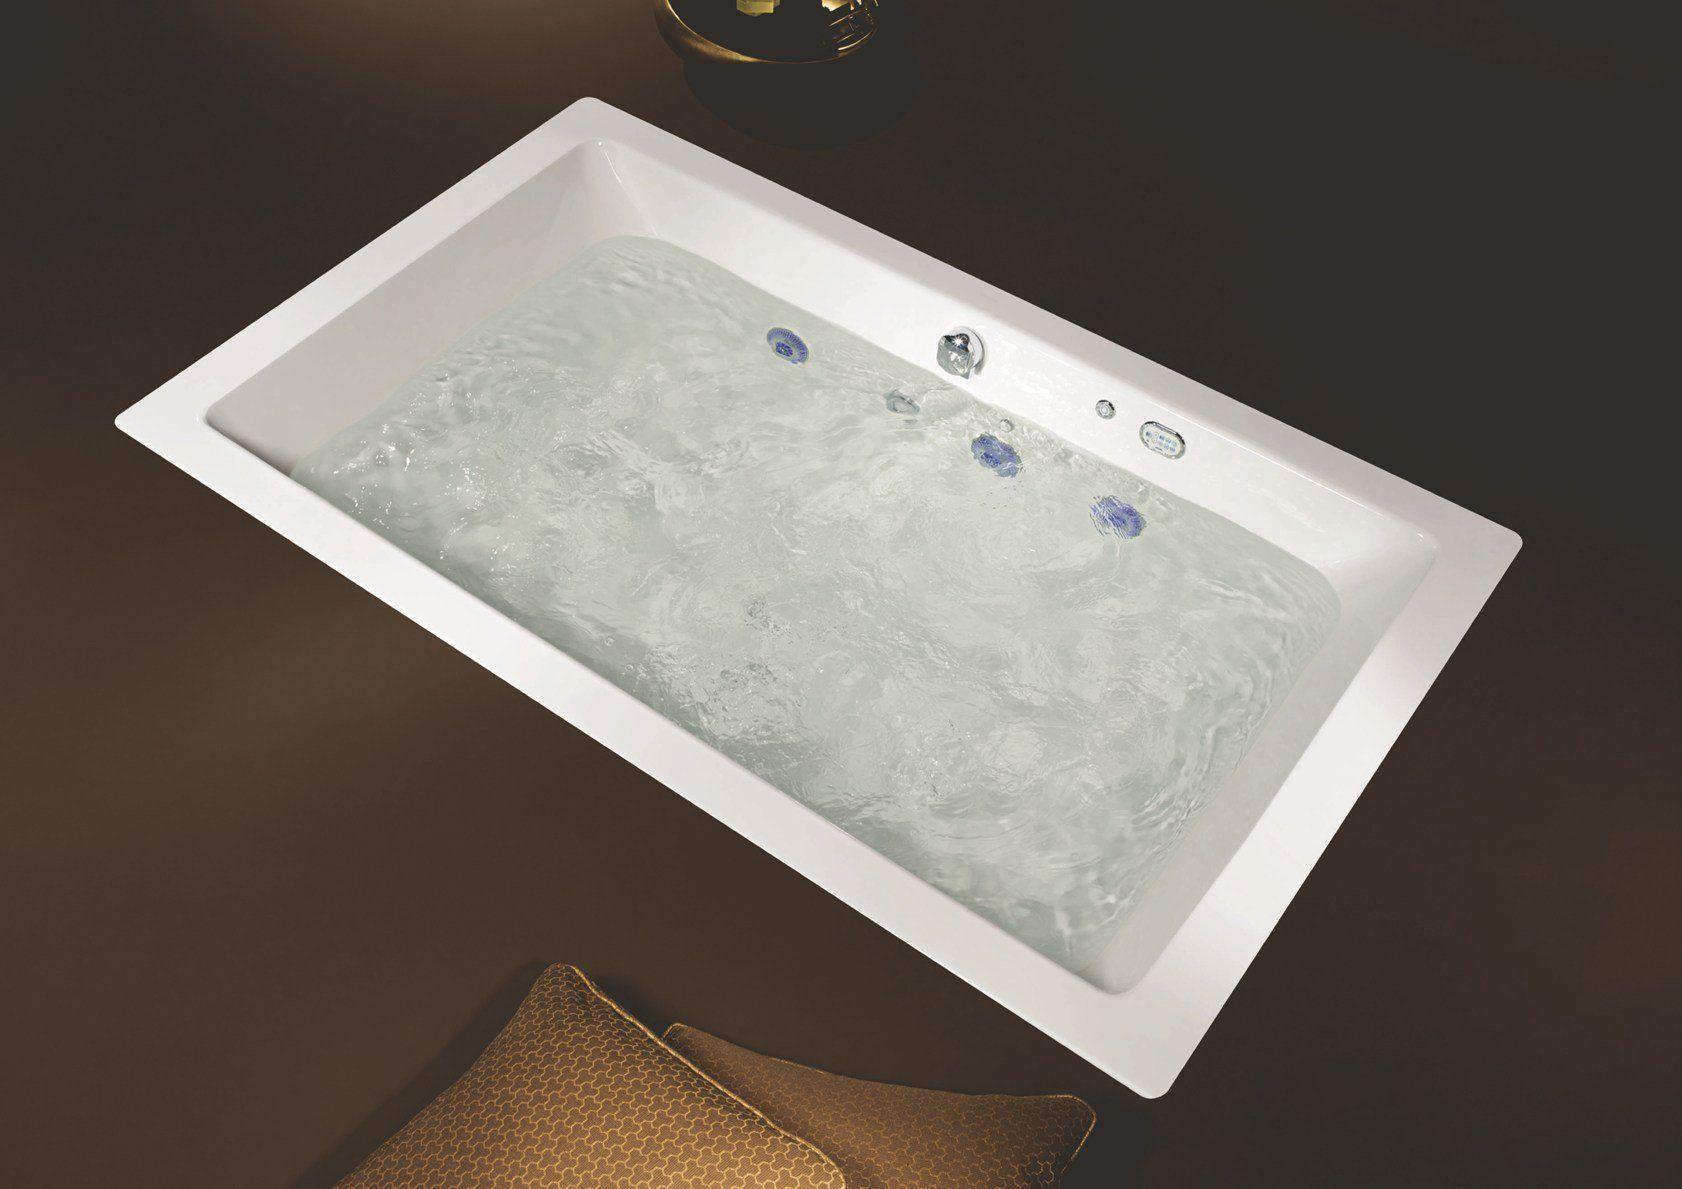 Vasca Da Bagno Kaldewei Dimensioni : Conopool di kaldewei nuove dimensioni per il bagno